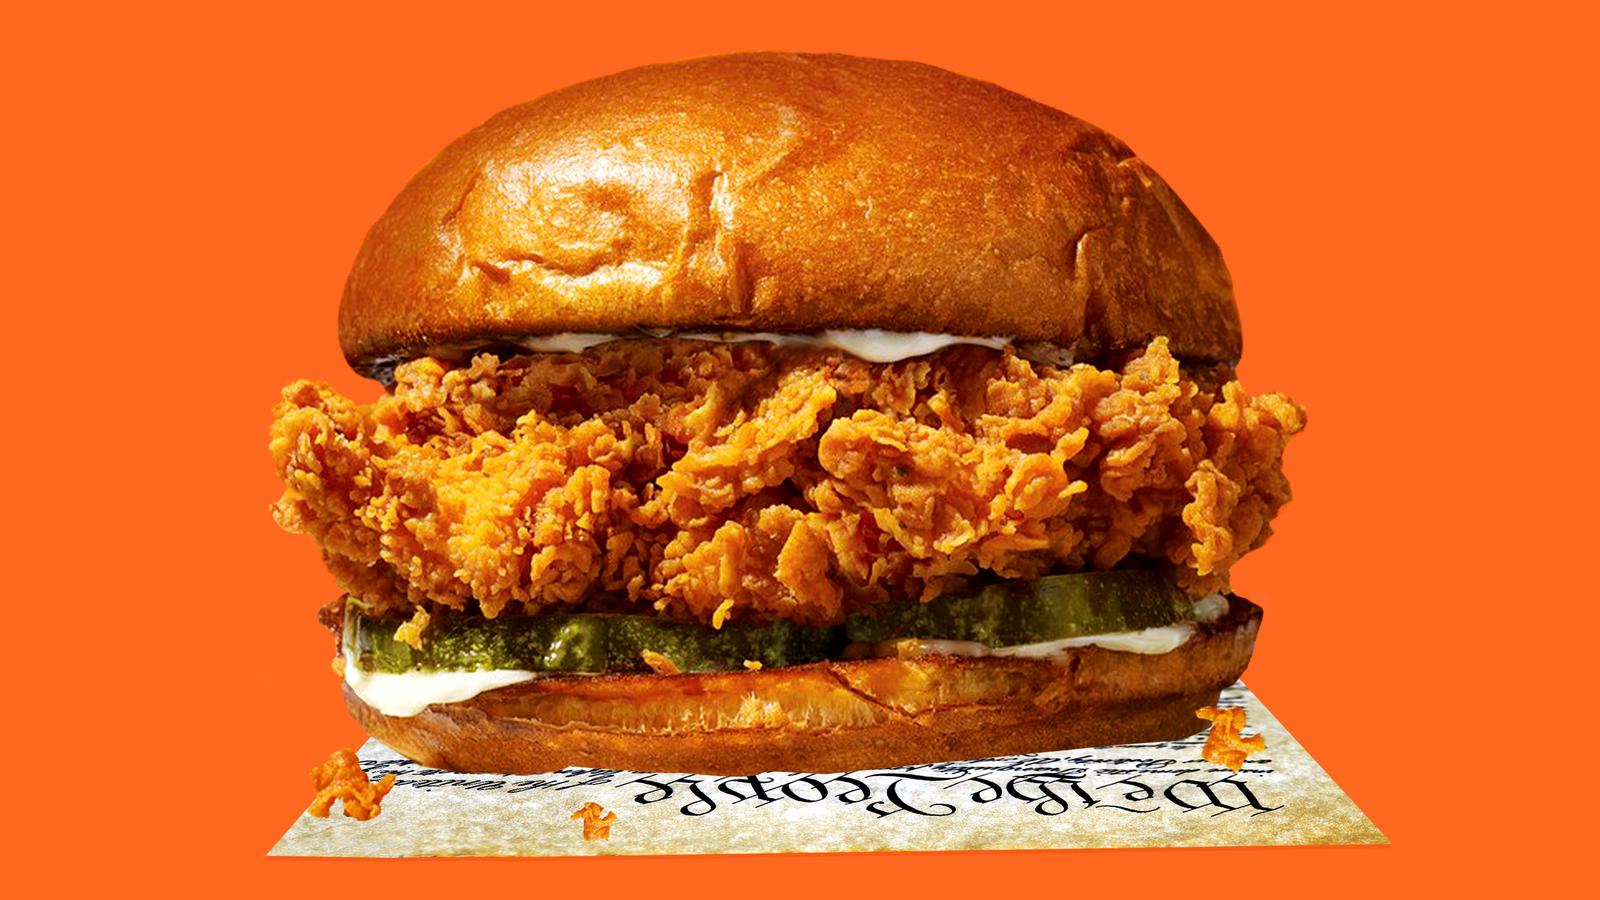 The Last Popeyes Chicken Sandwich in America